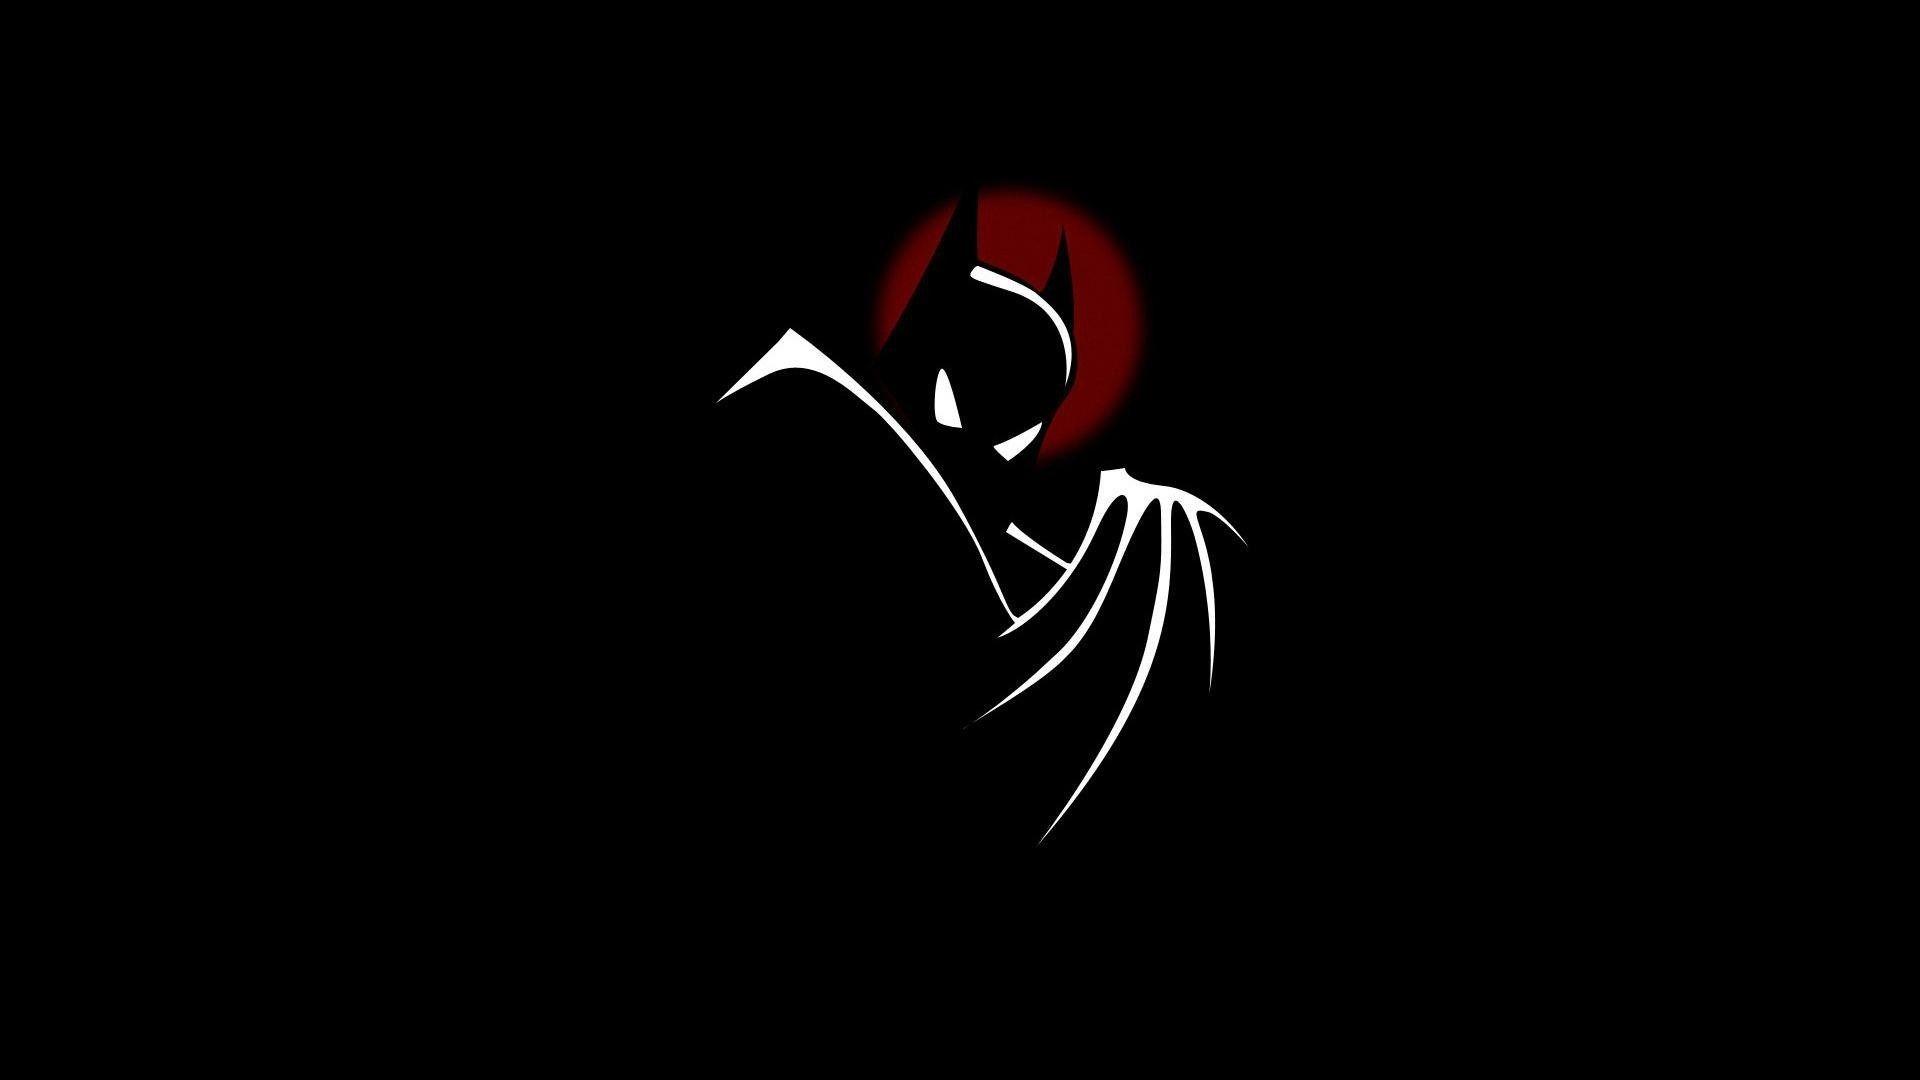 1920x1080 batman screensavers and backgrounds free JPG 53